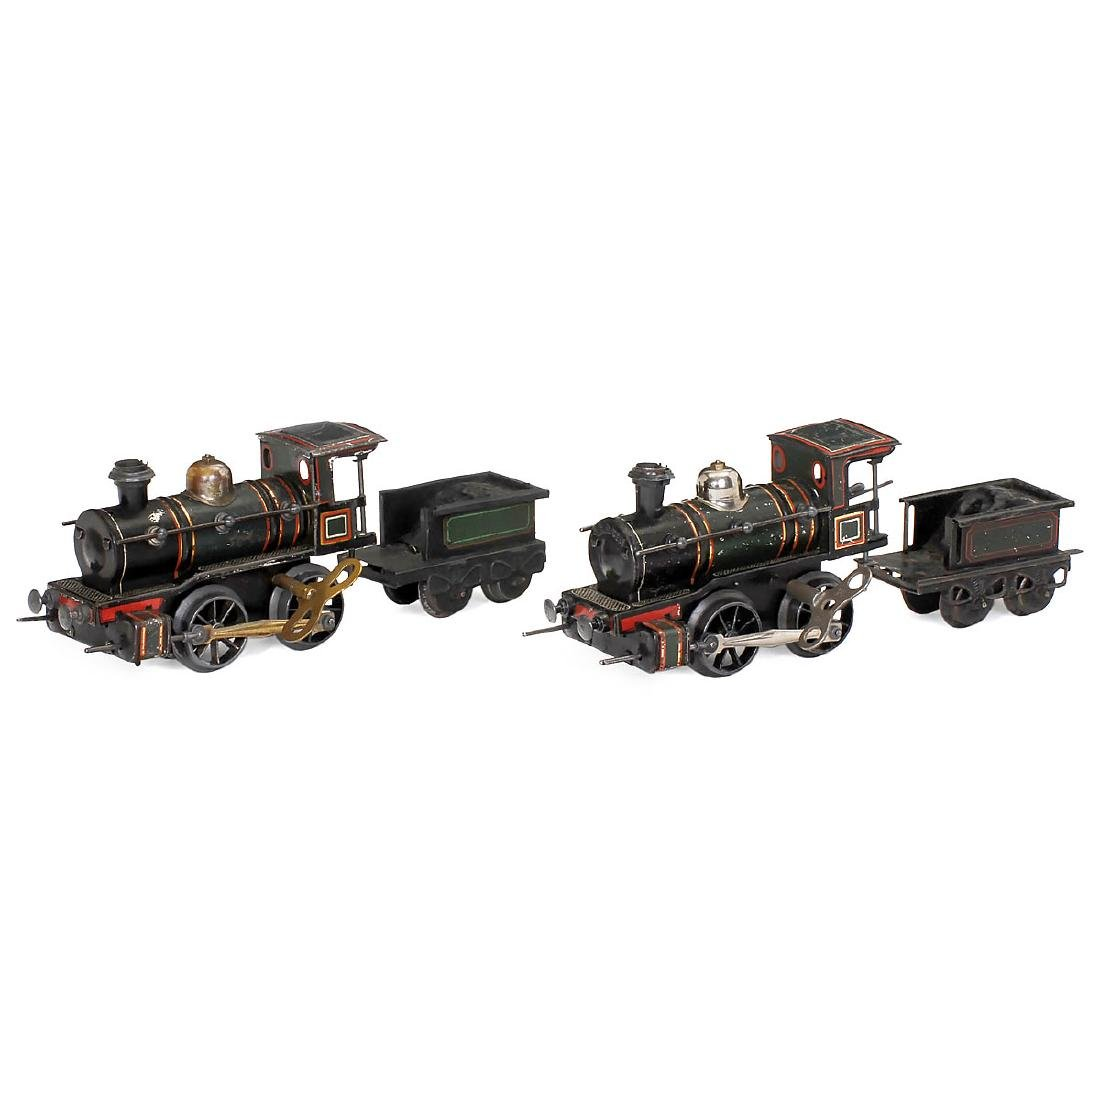 2 Steam Locomotives by Carette, c. 1915